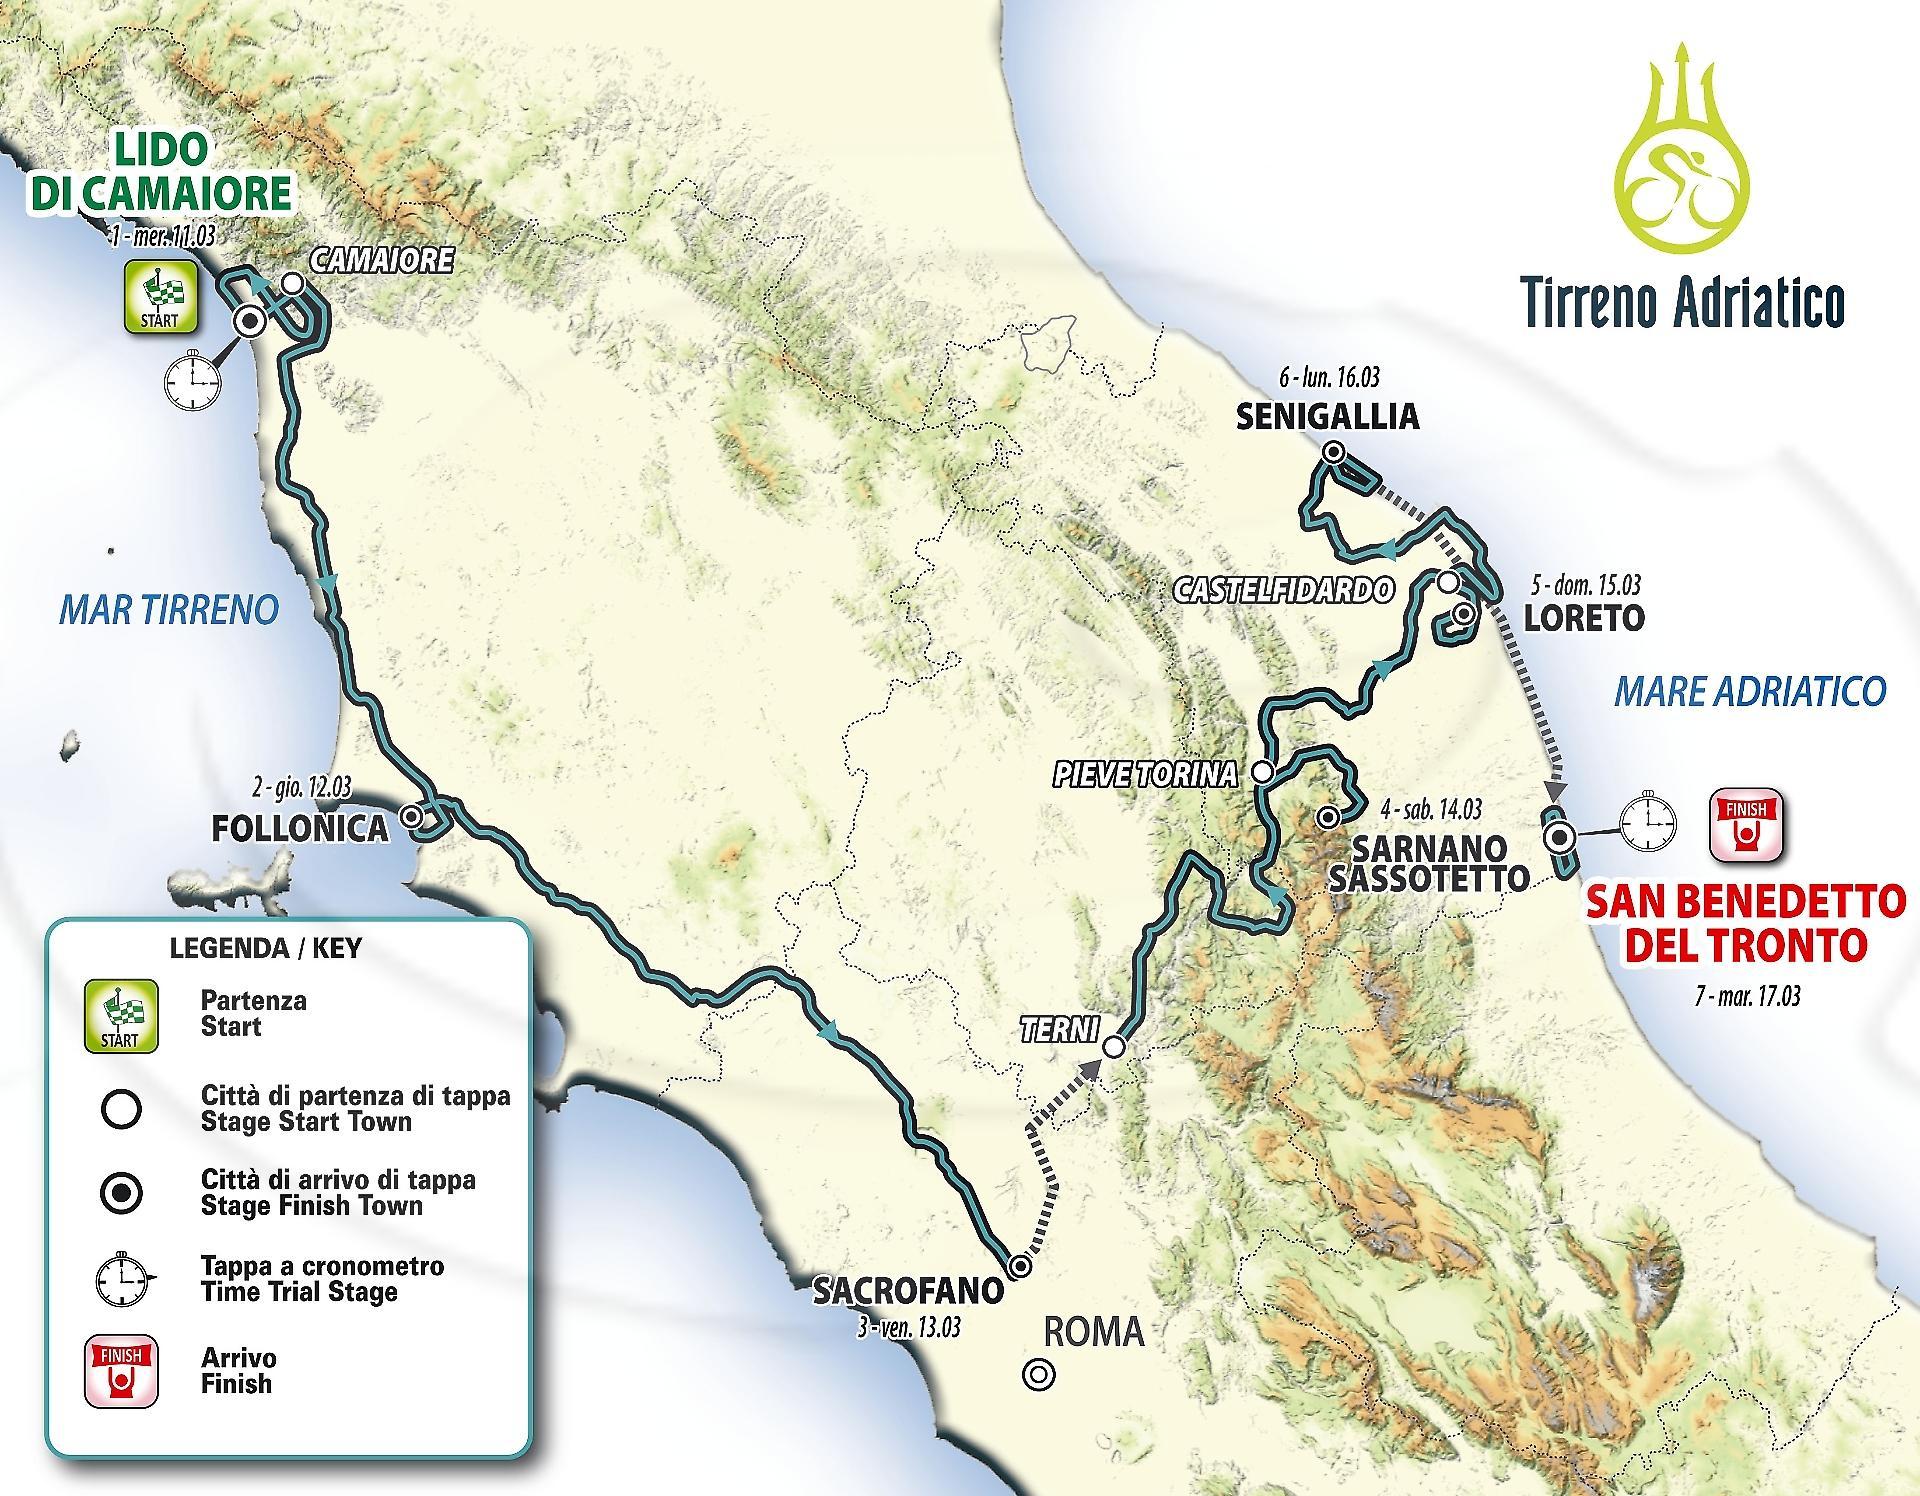 Tirreno Adriatico parcours